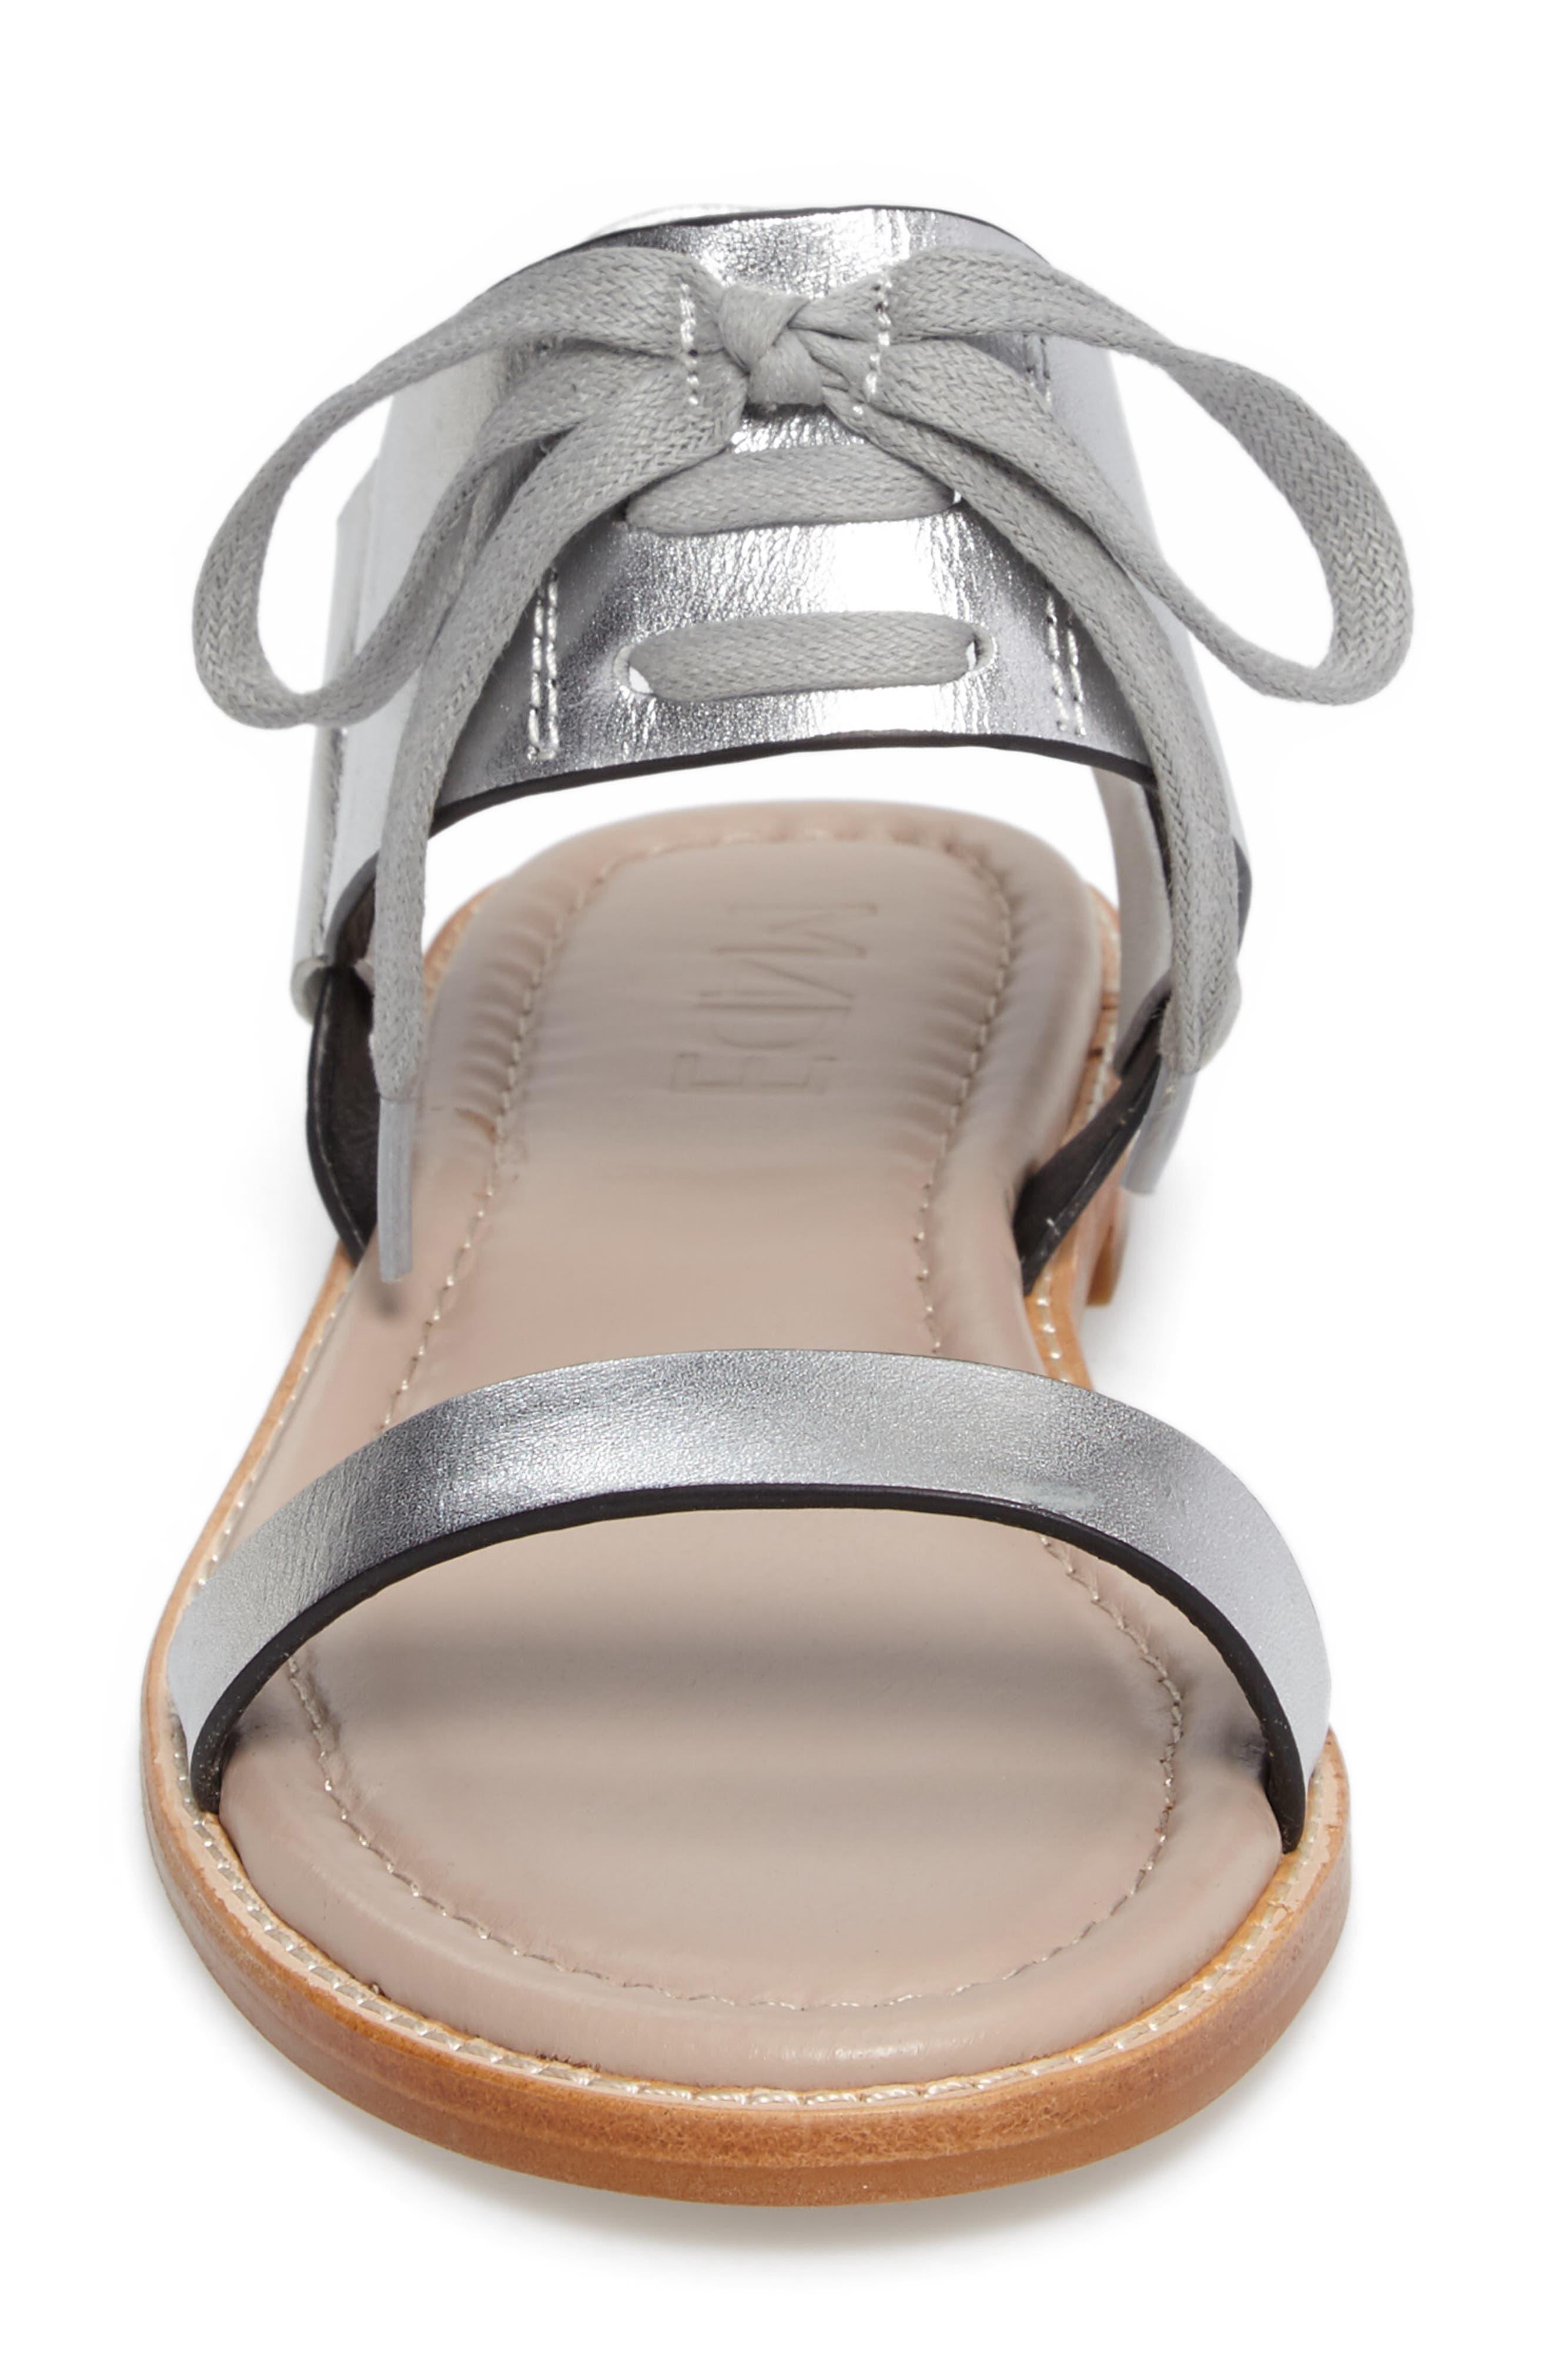 M4D3 Hailey Slingback Sandal,                             Alternate thumbnail 4, color,                             Silver Leather